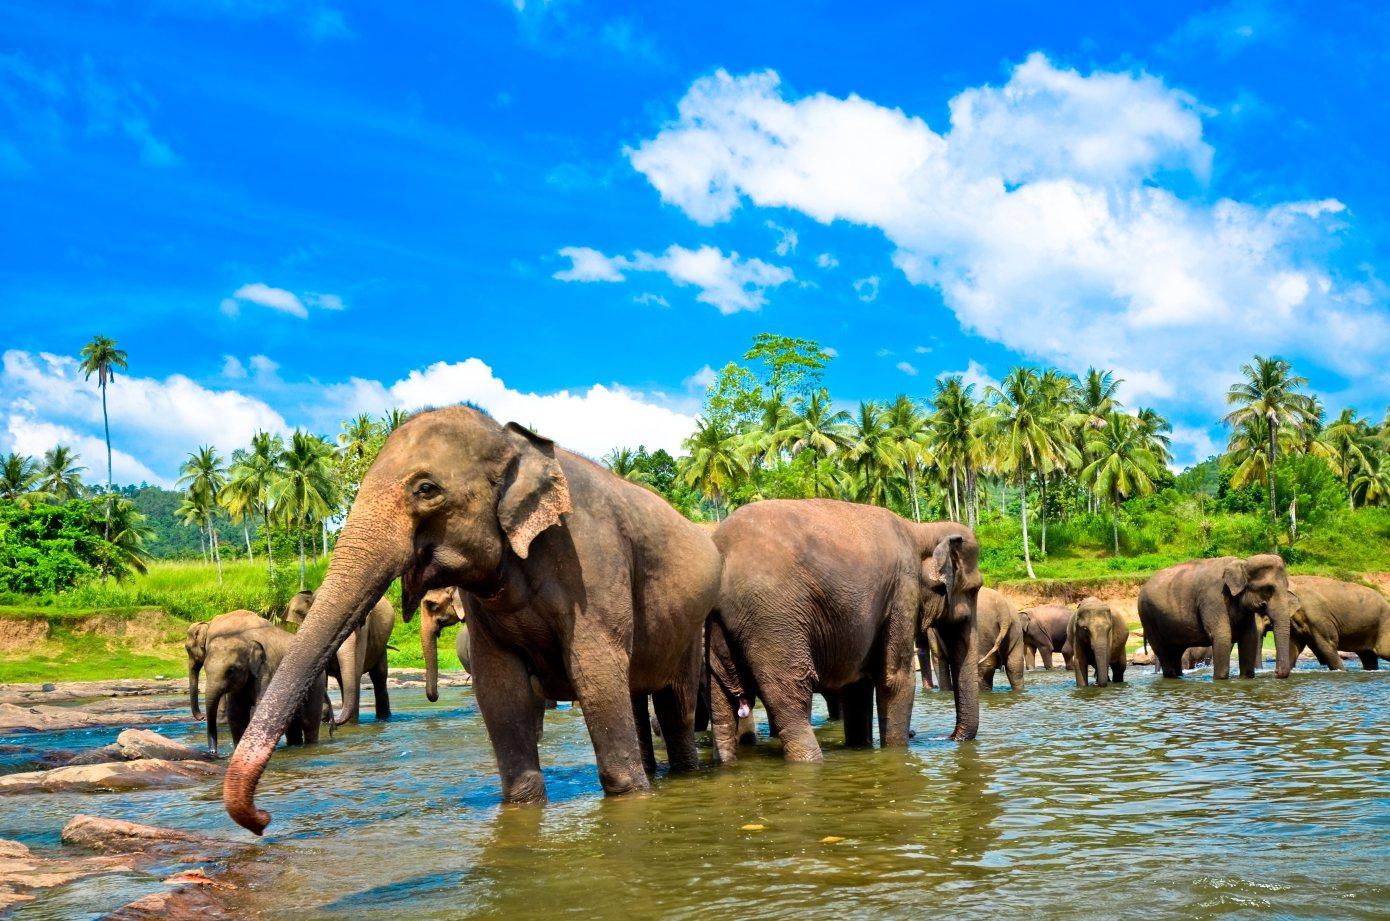 Sri-lanka-slonie-Depositphotos_32883393_original-1390x921px